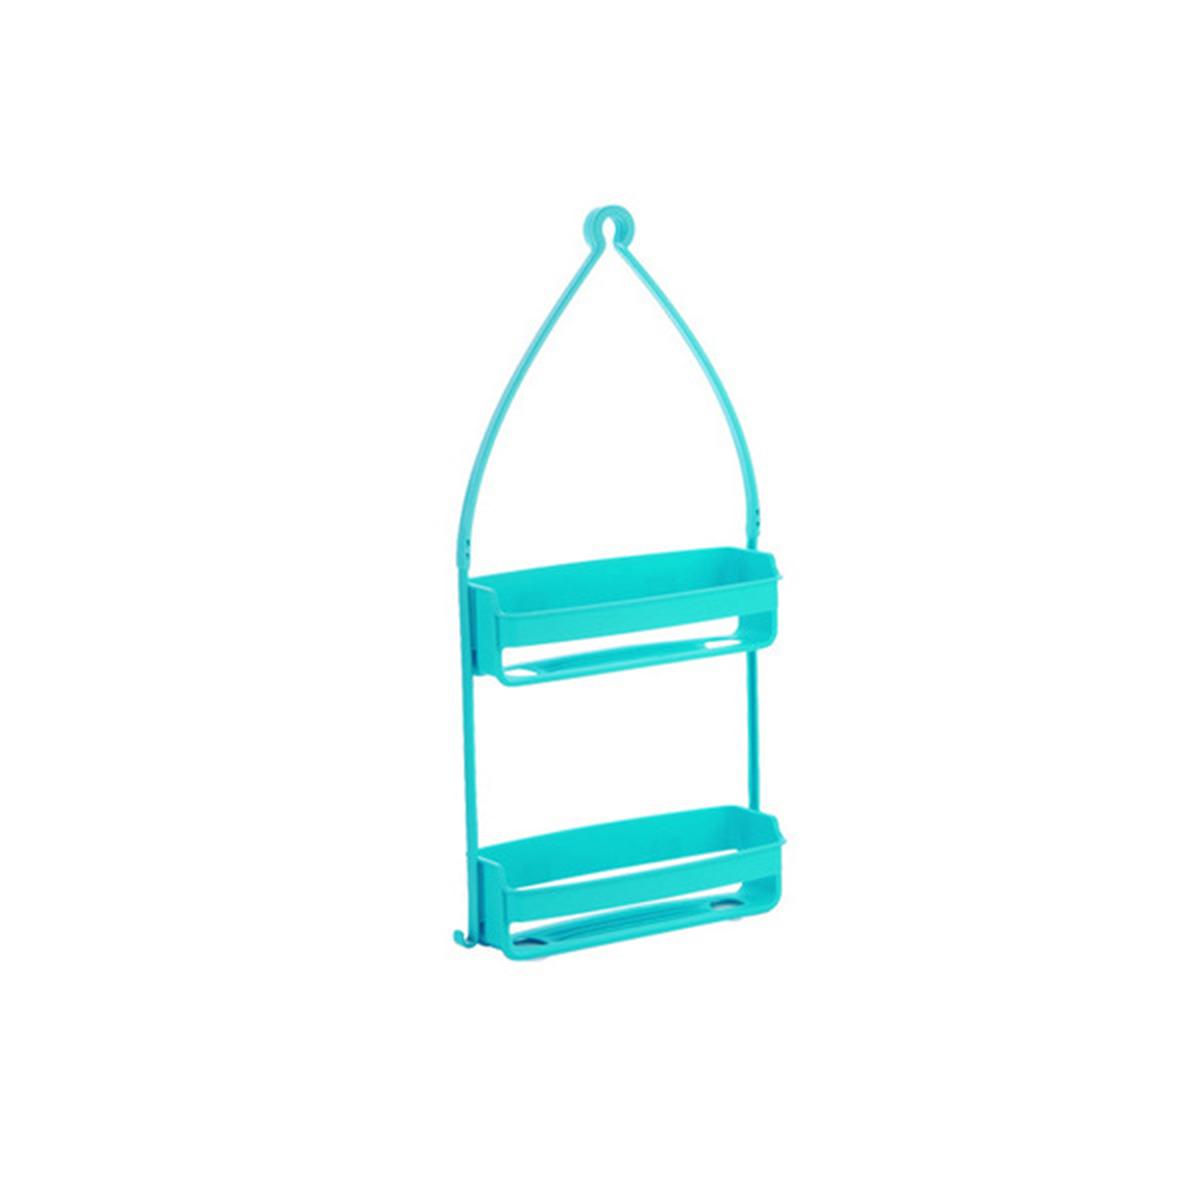 2 Tier Hanging Shower Caddy Rack Tidy Basket Organiser Bathroom ...